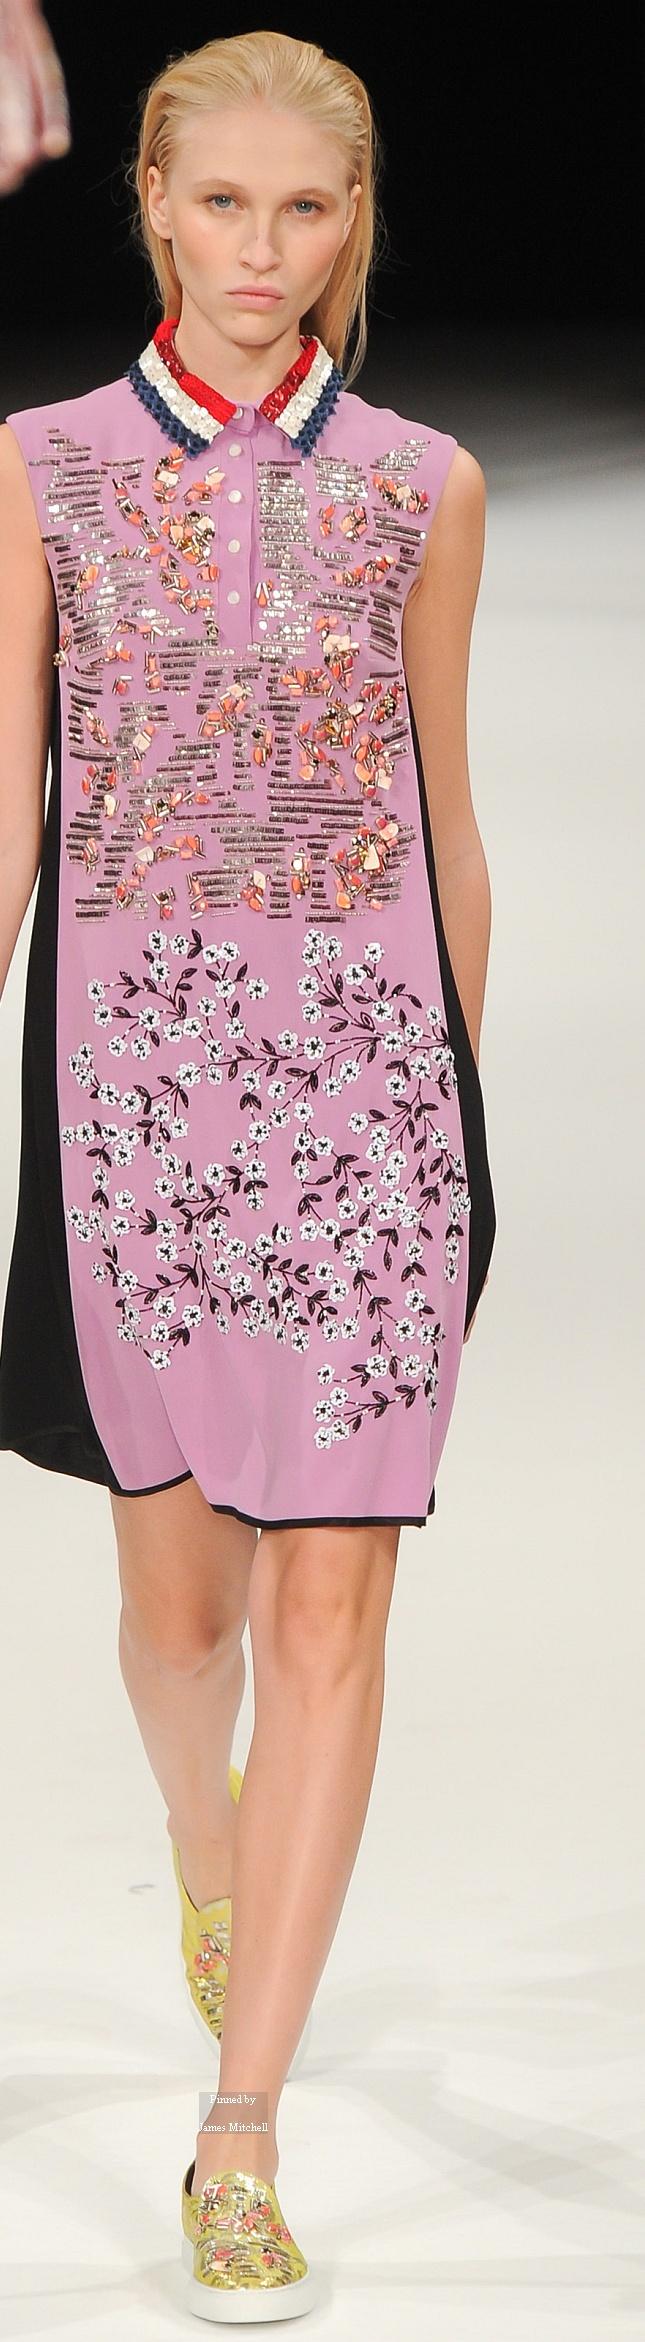 Talbot Runhof Spring Summer  Ready-To-Wear collection